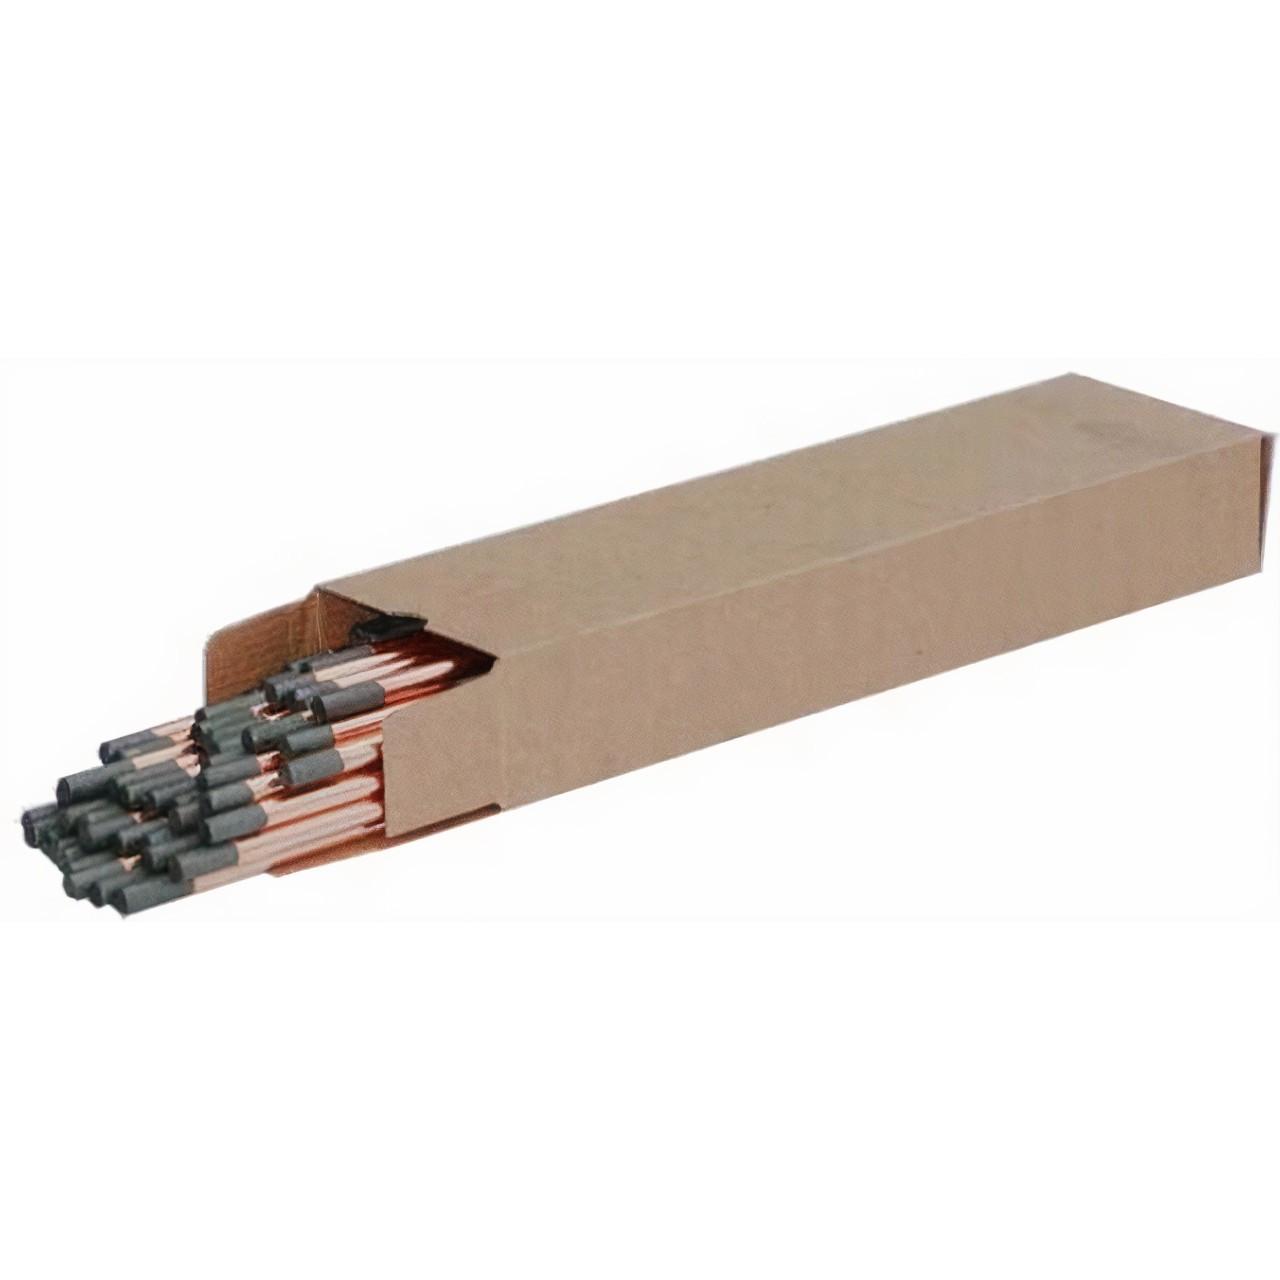 9.5mm DC Gouging Carbons 50/pk